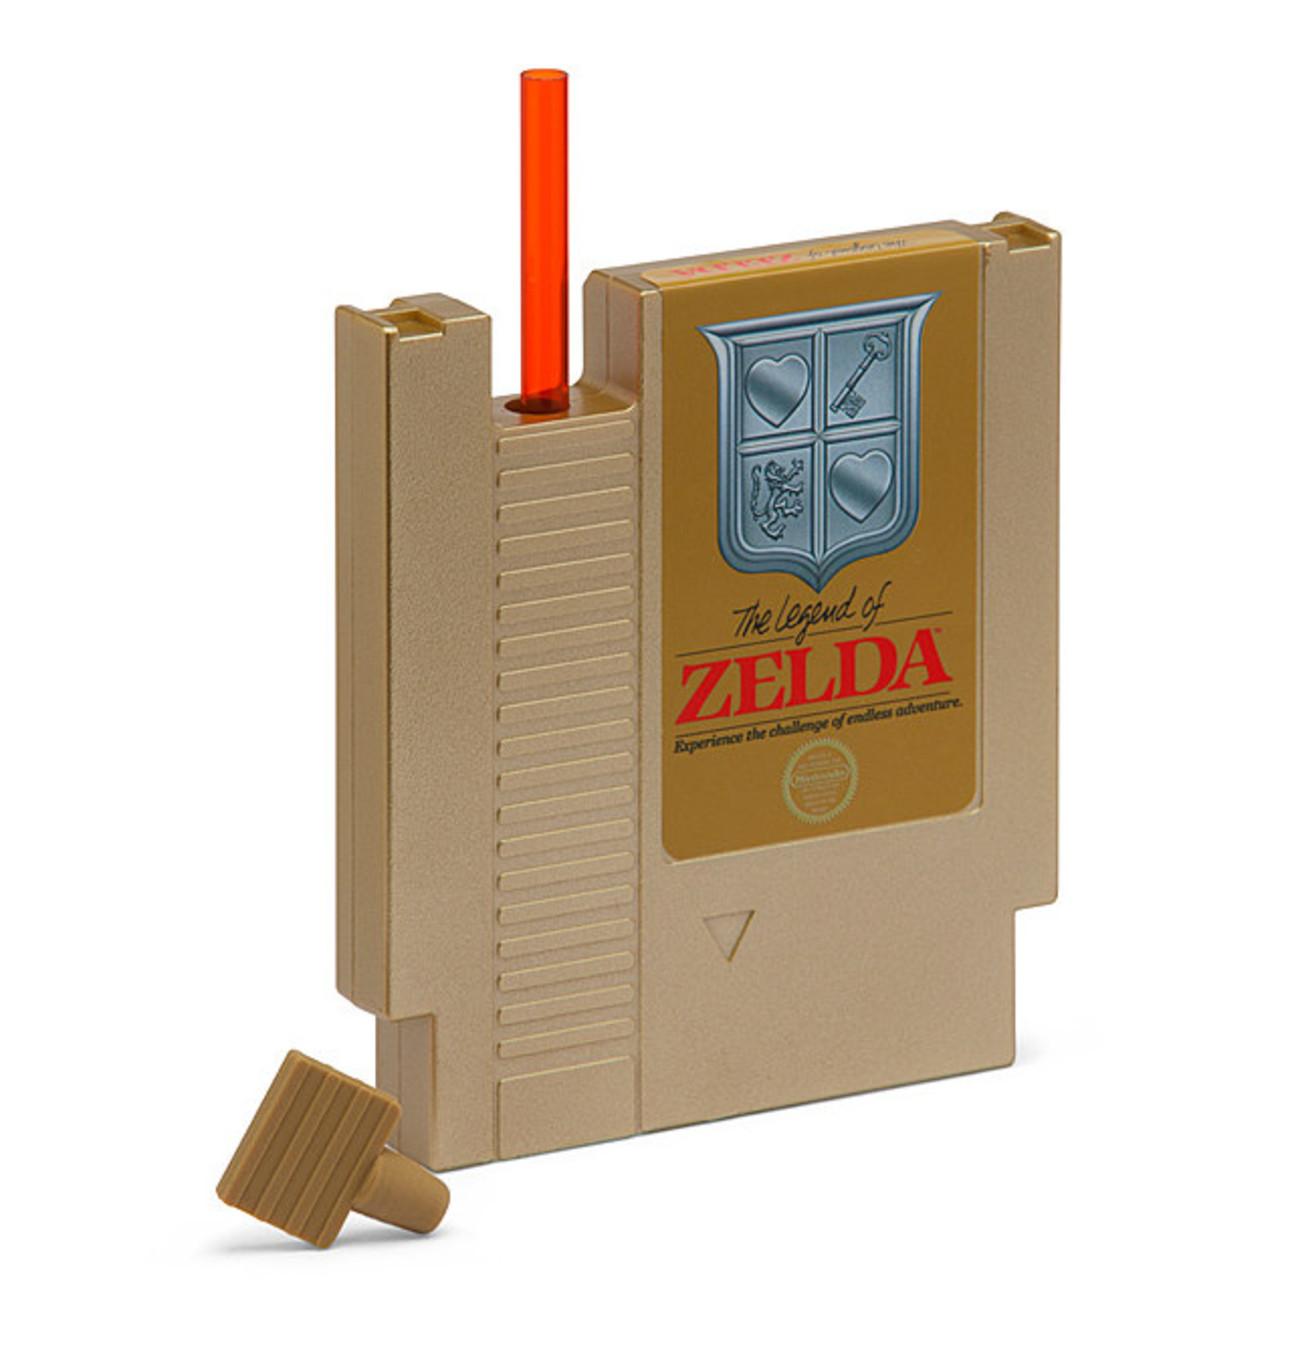 zeldacartridge.jpg